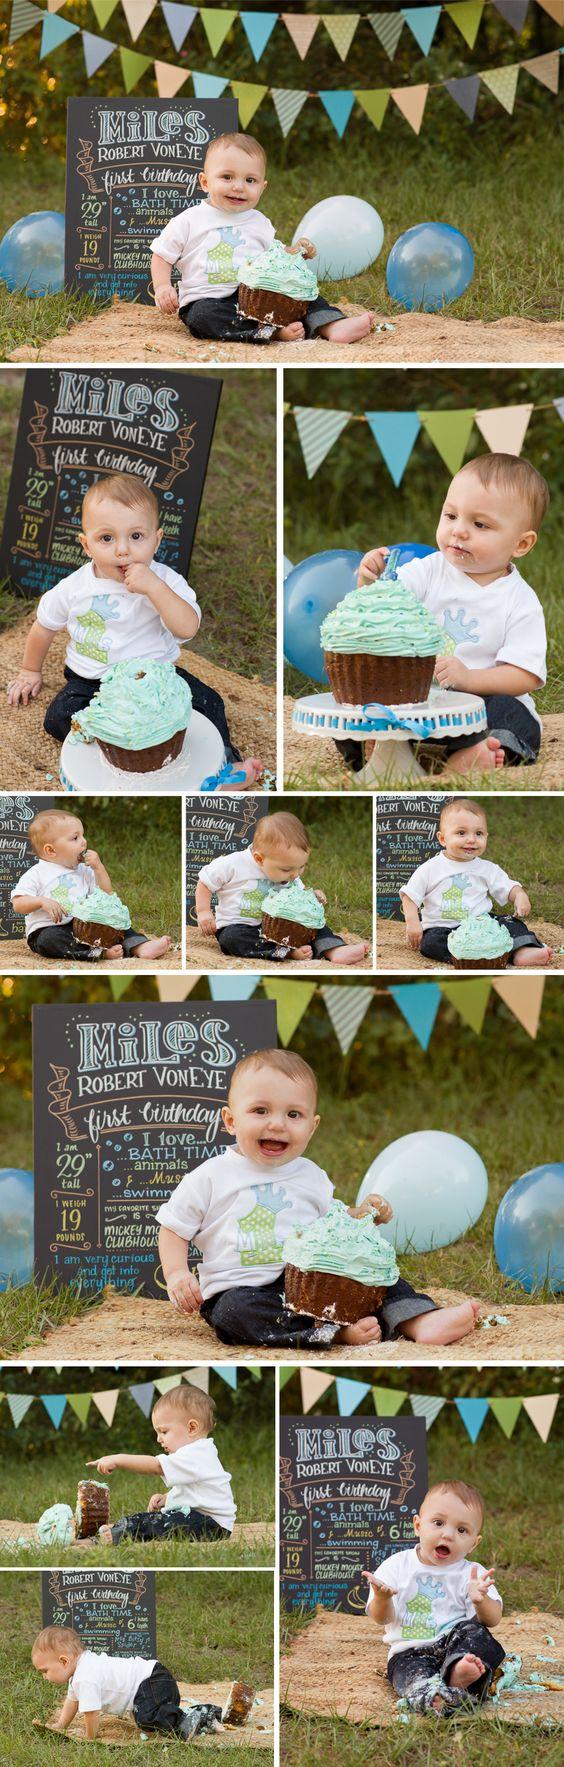 Outdoor Cake Smash, One Year Birthday Photos, Baby Photographer Tampa, Baby Boy Photos